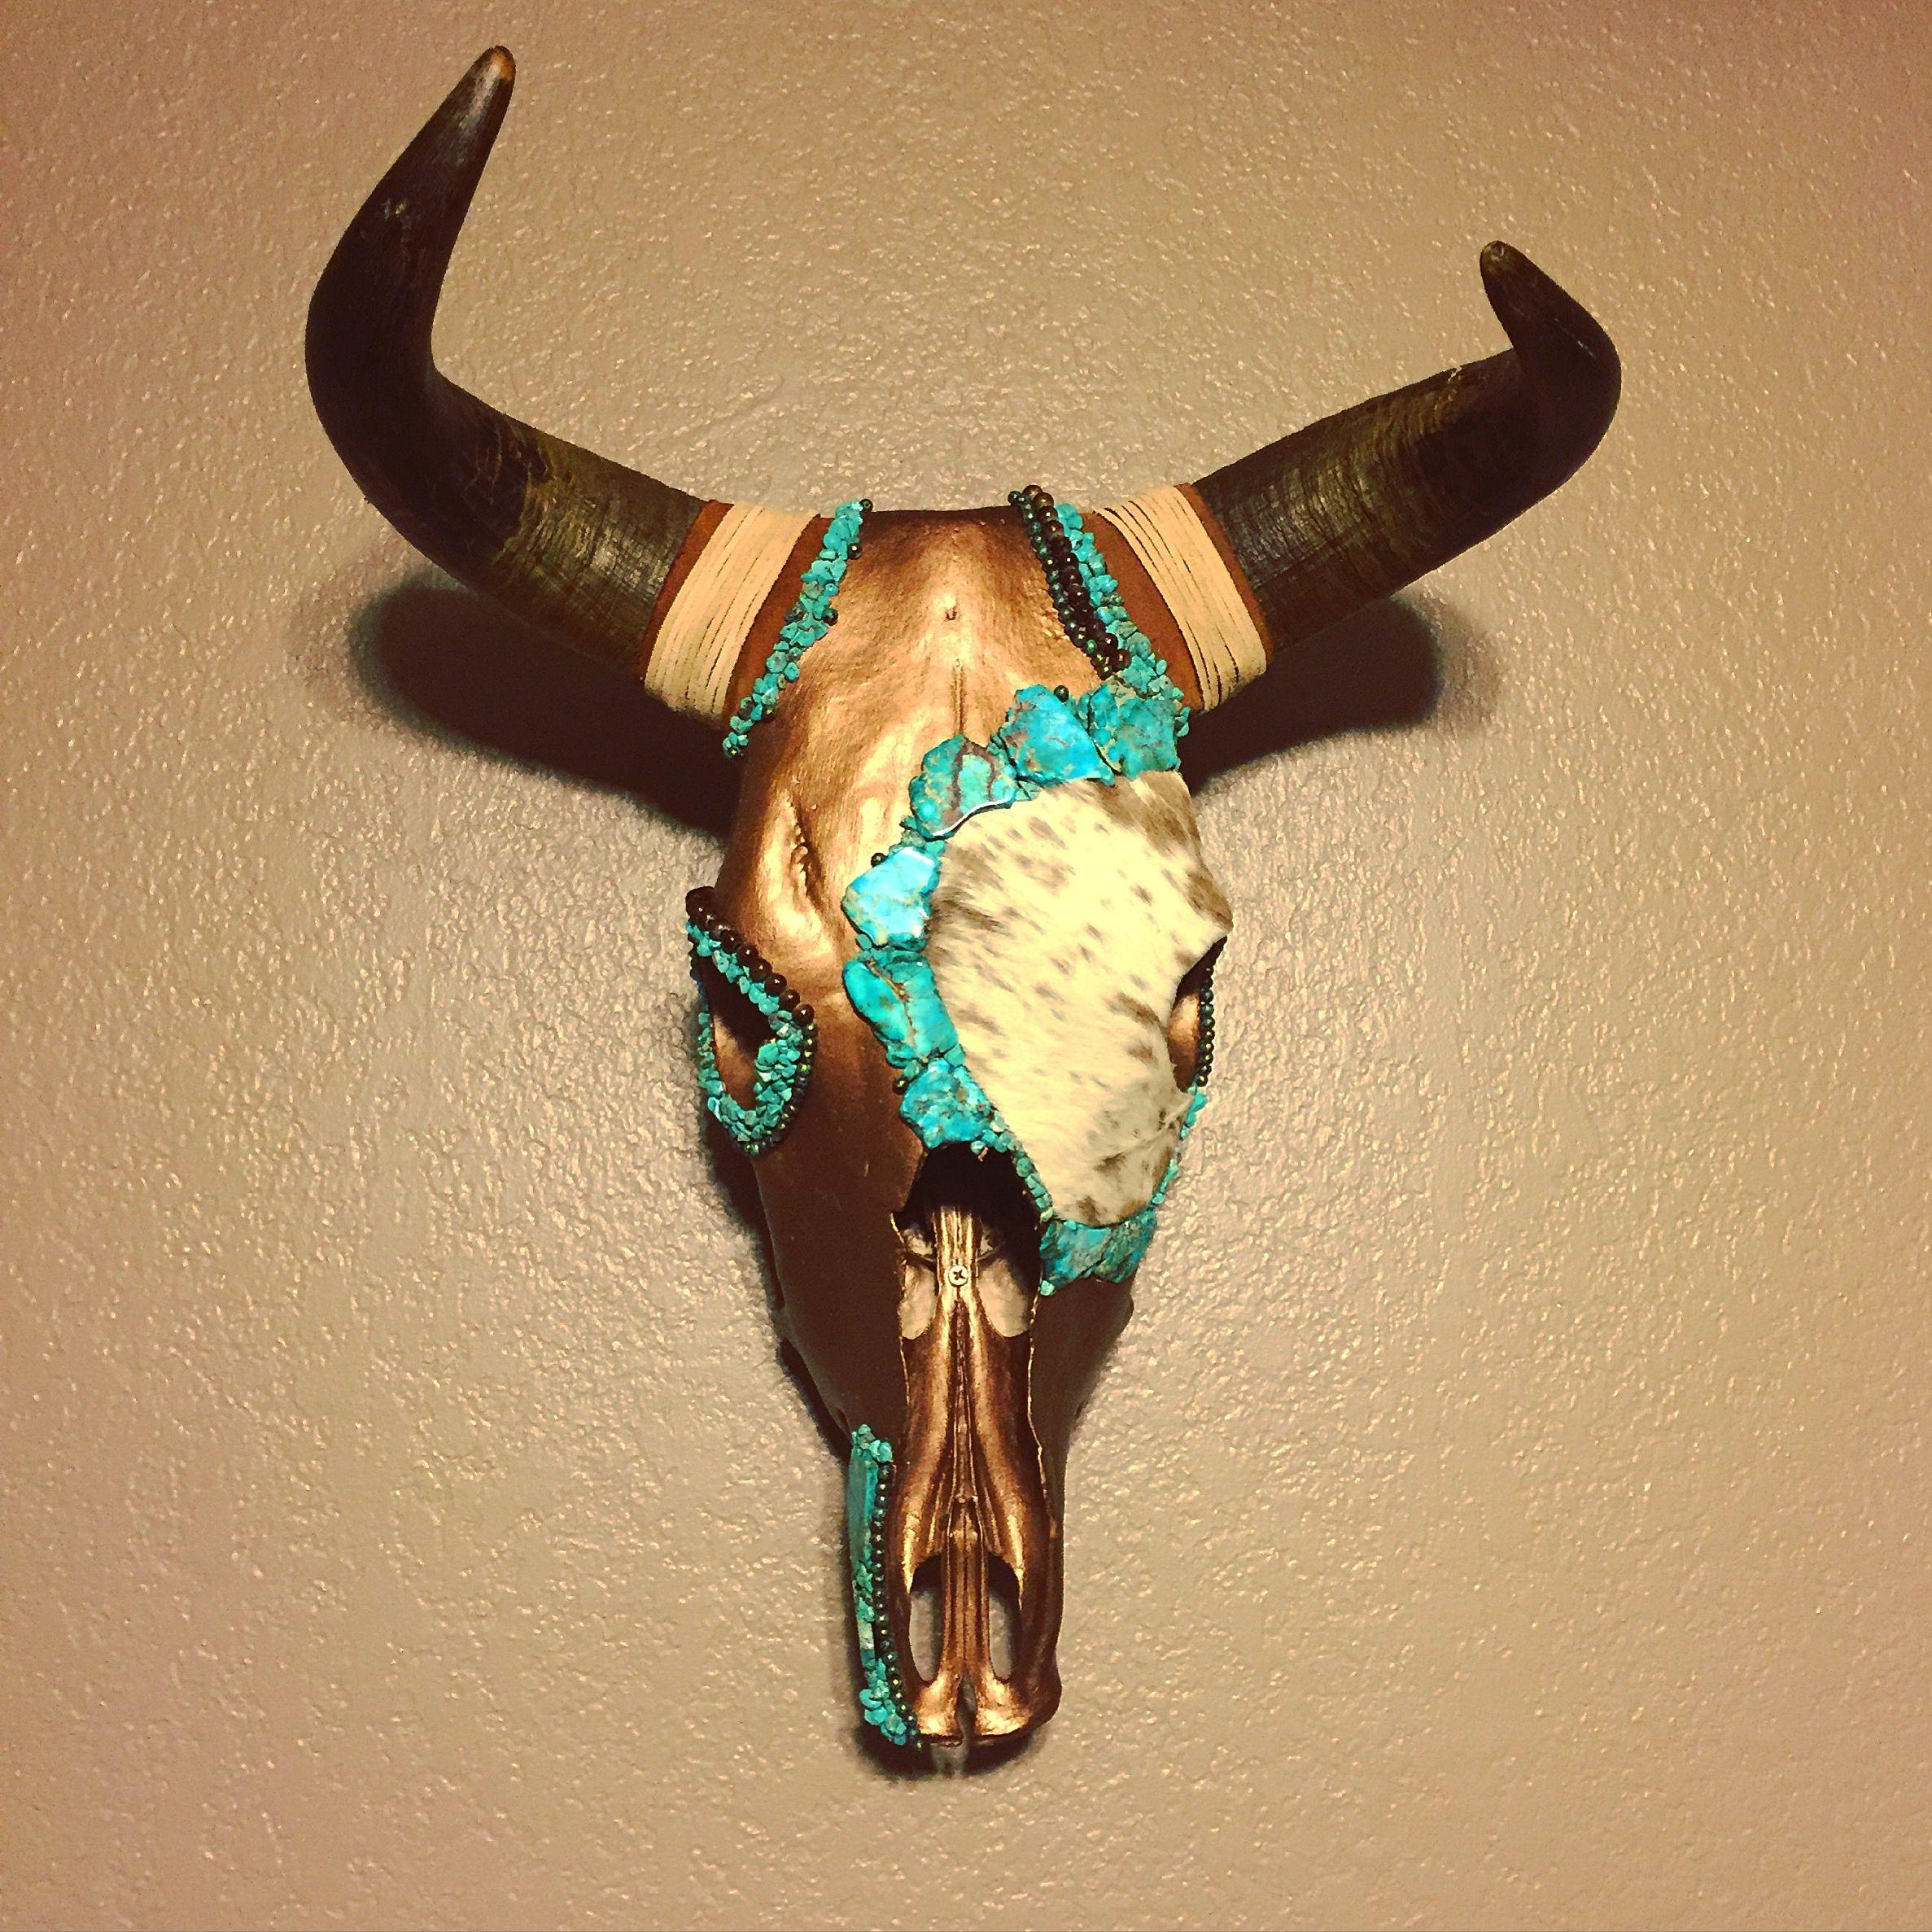 Cow Skull Decor - Coppertop Eclectic & Unique Designs   Antlers ...